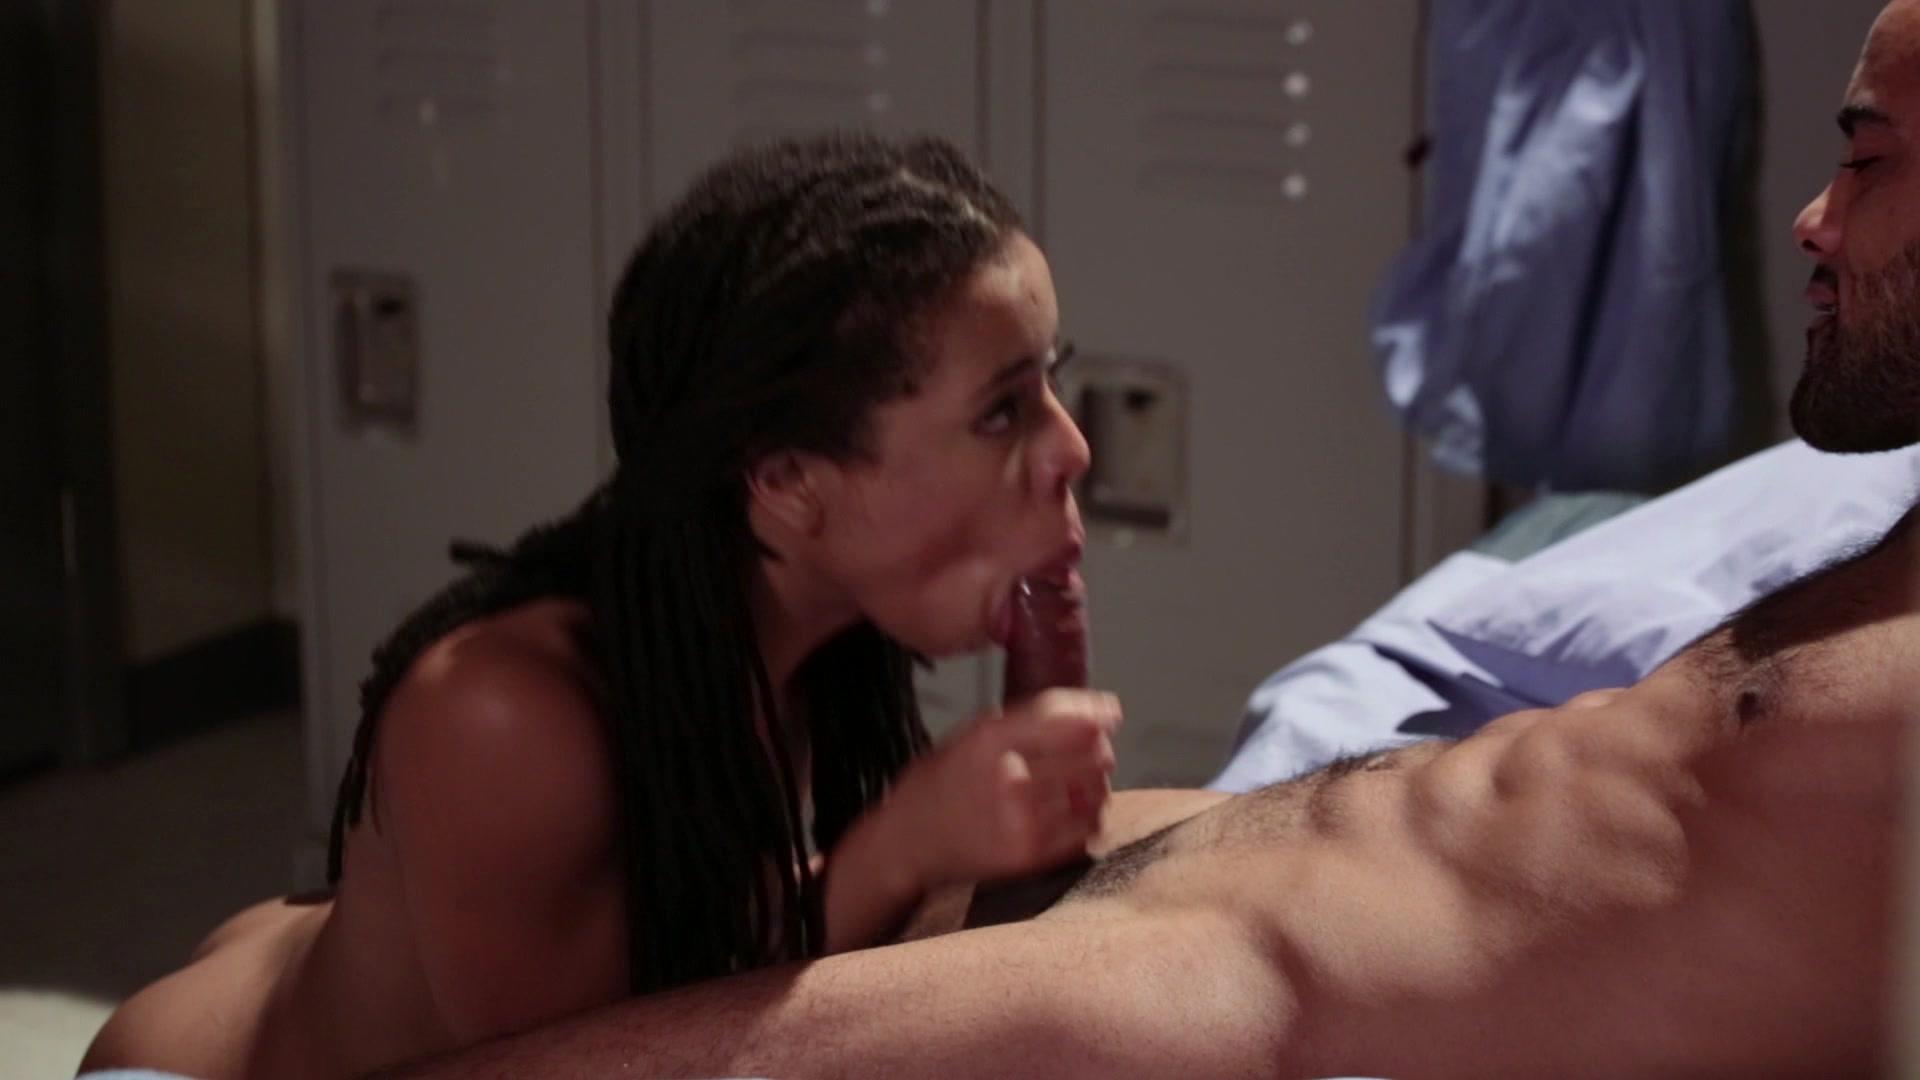 Yasmine fucks babe chanell in strapon lesbian fun 10